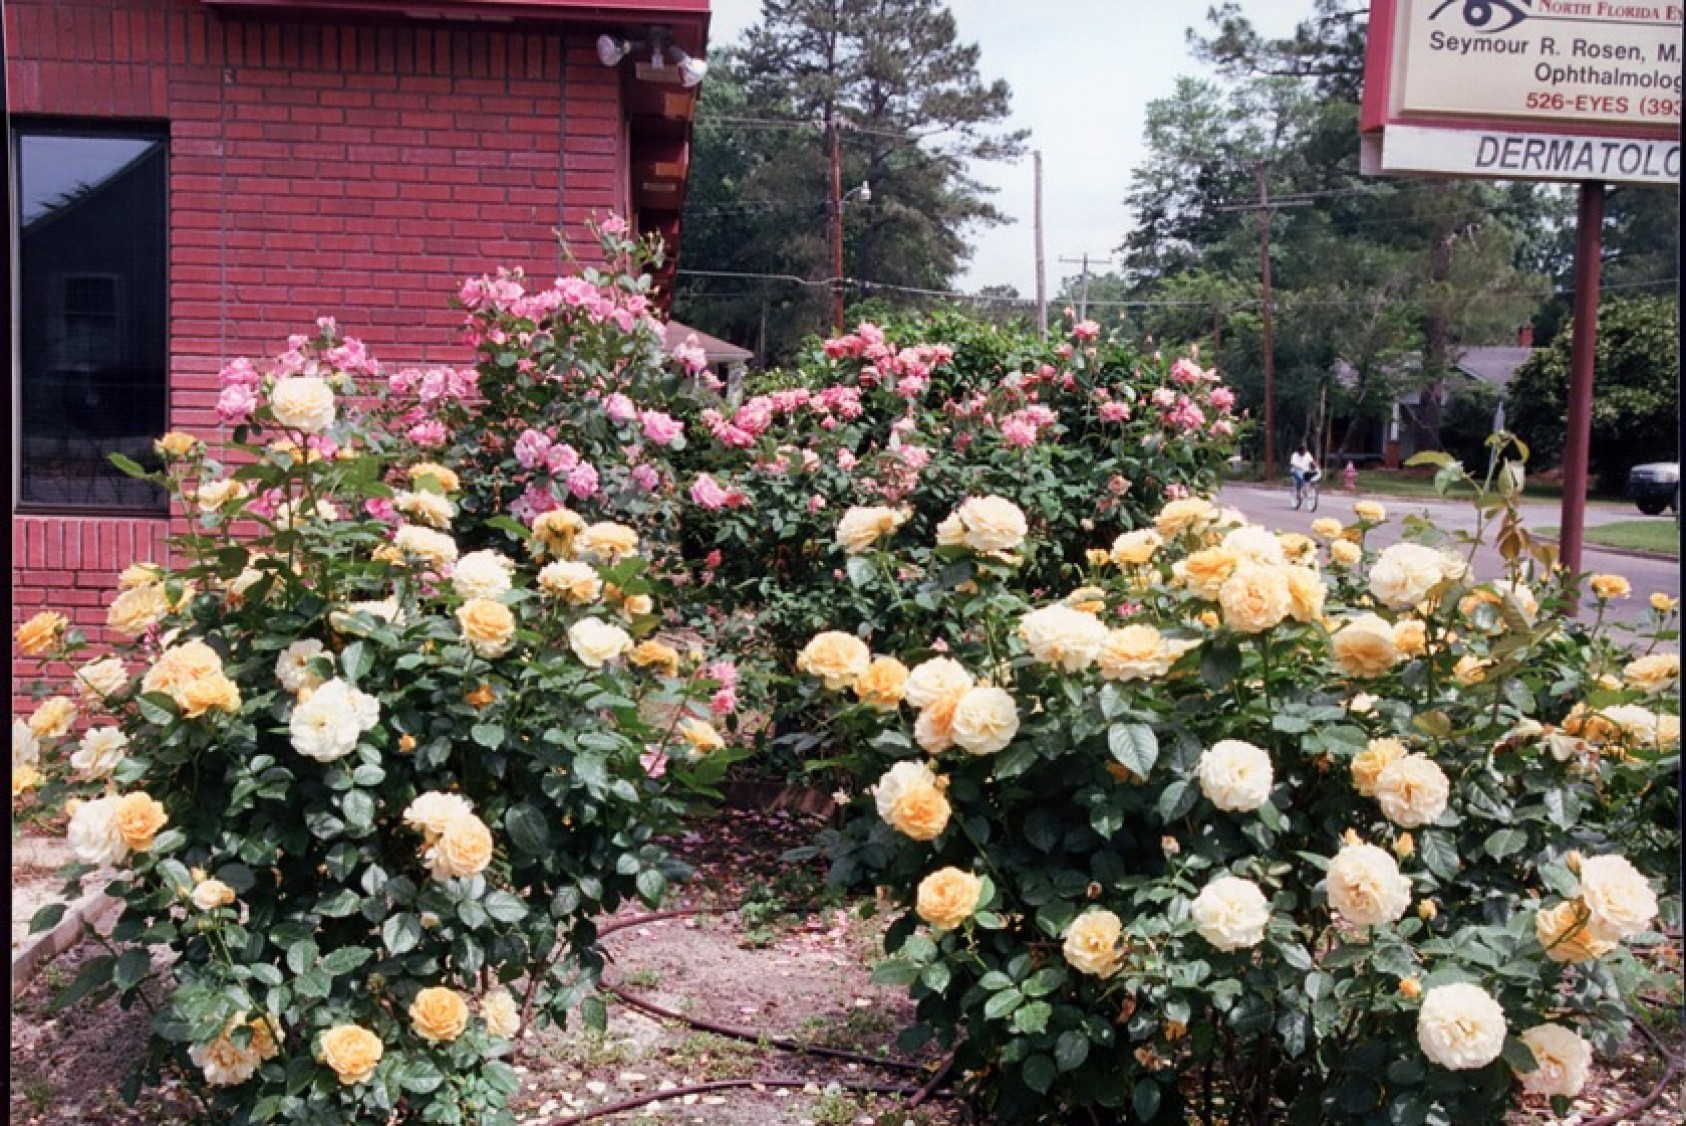 Roses in front of Dr. Seymour Rosen's former office building